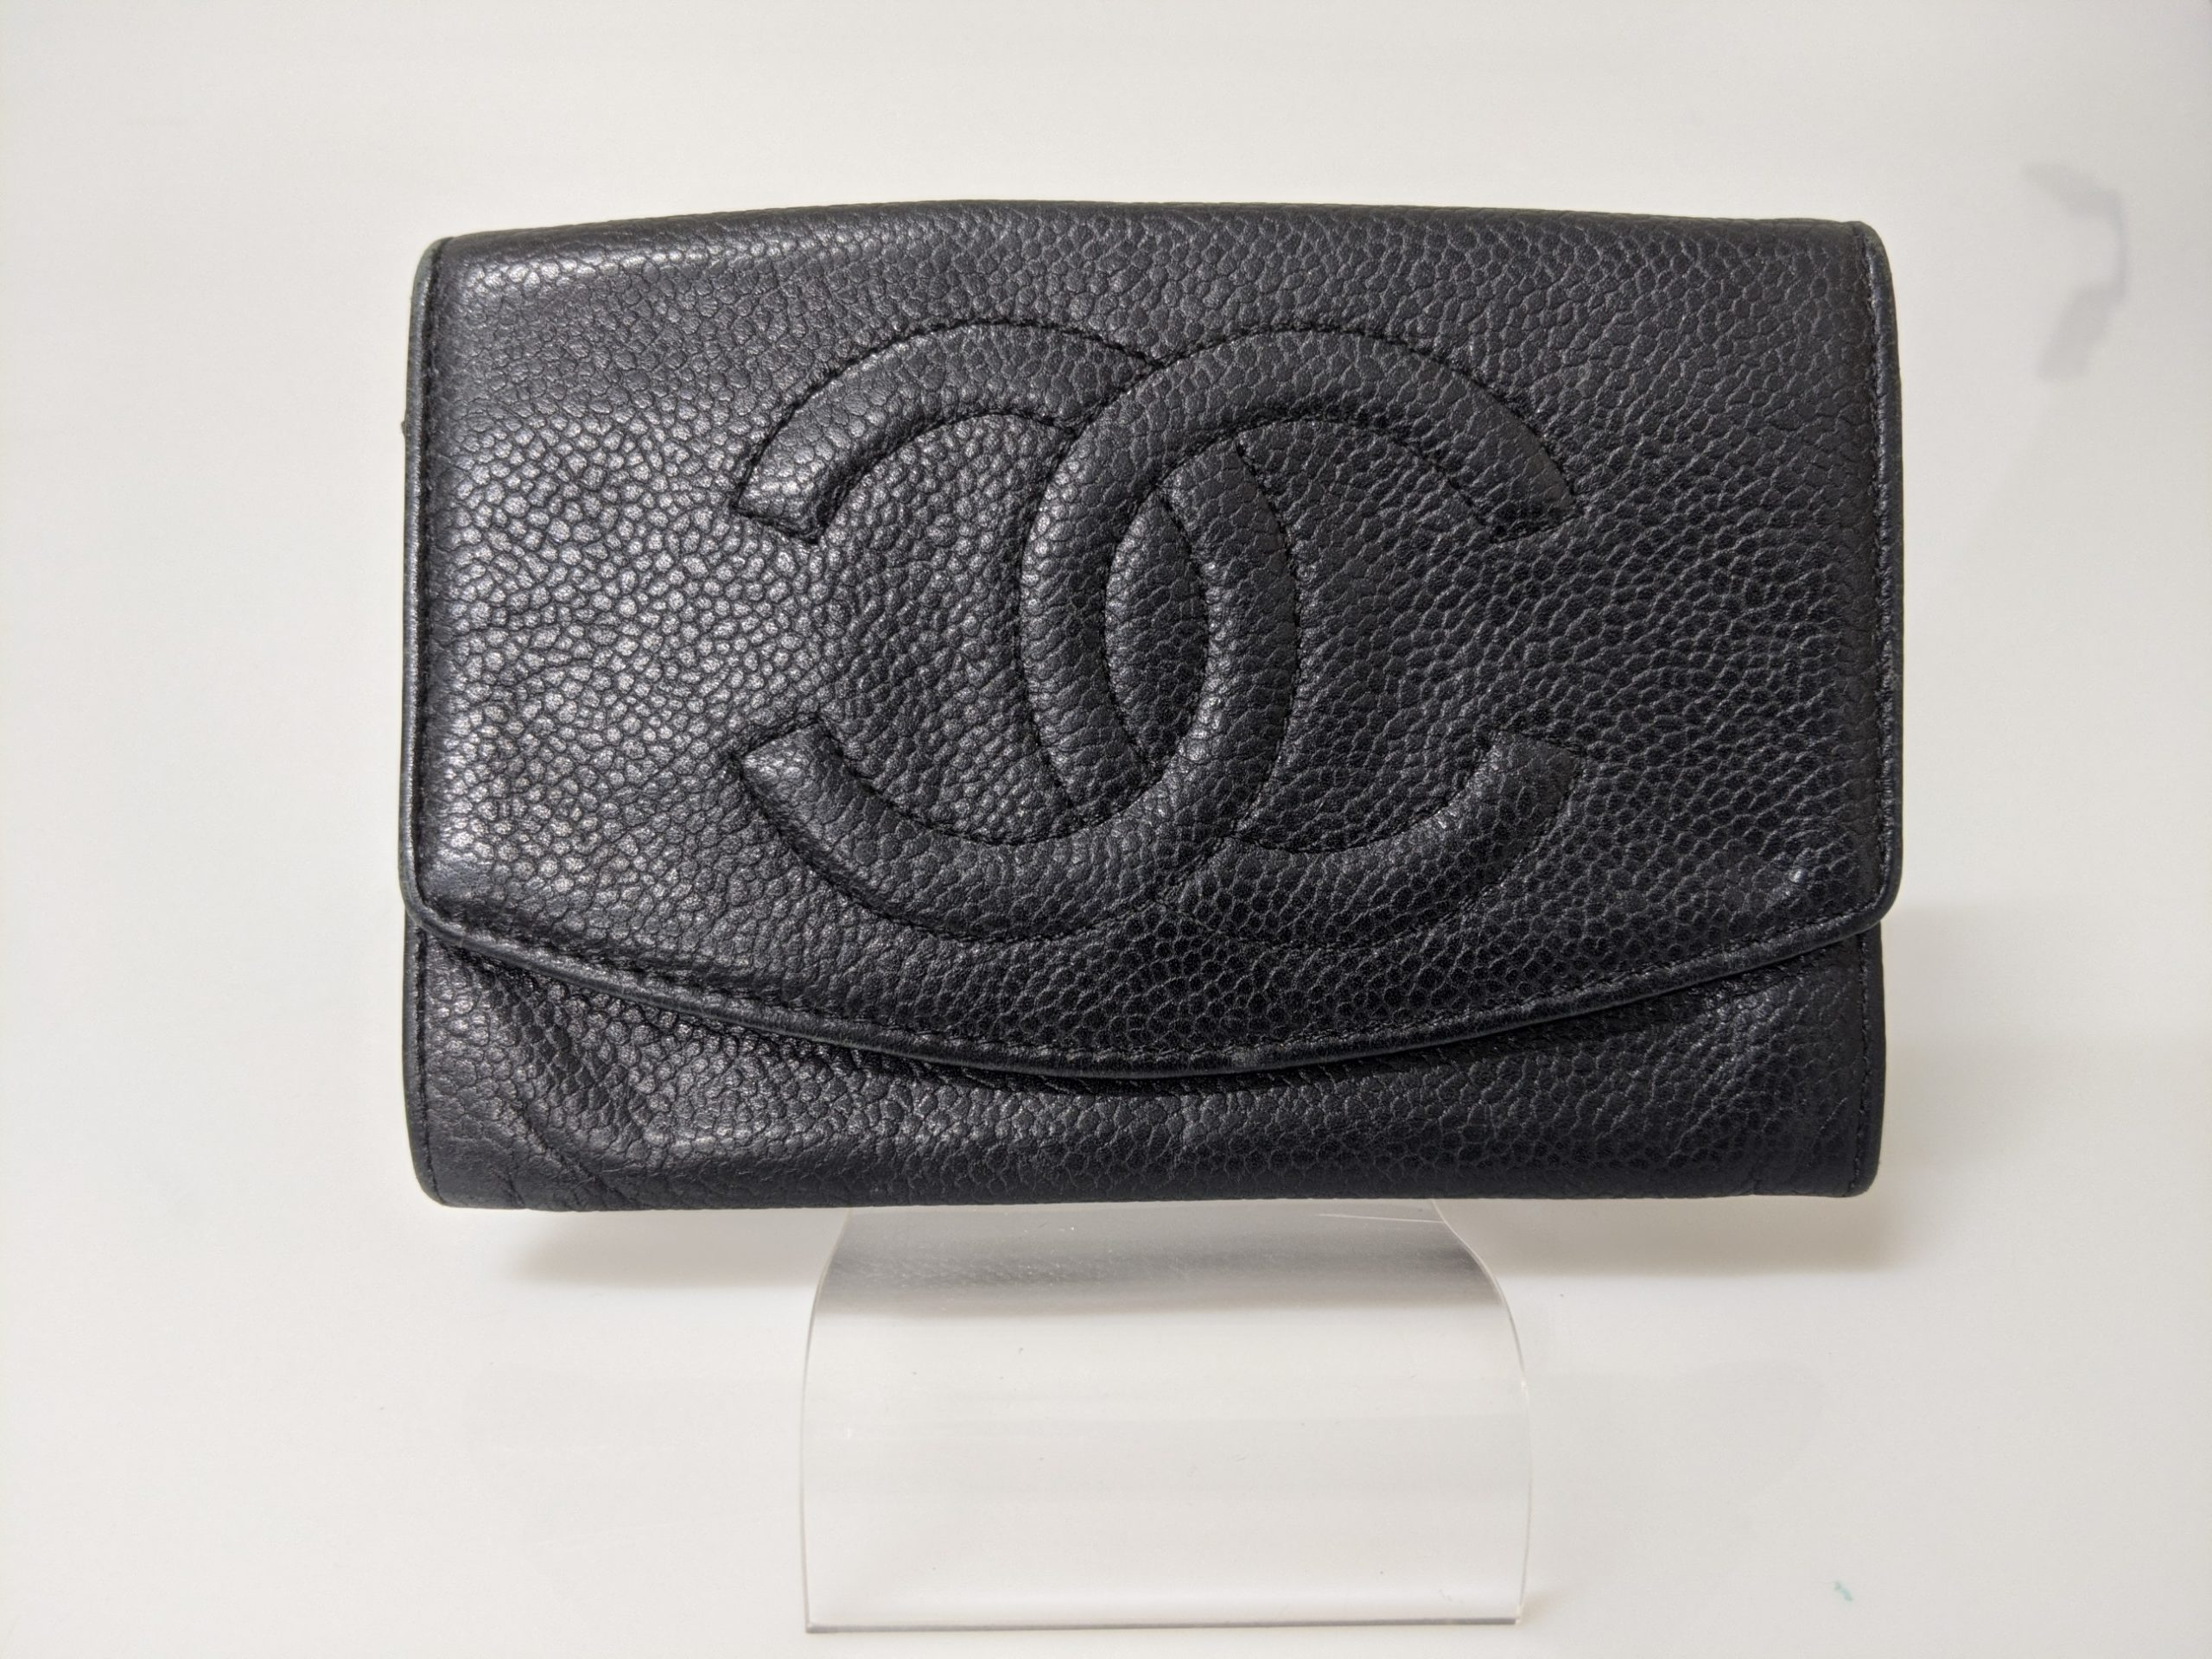 CHANEL,財布,装飾小物